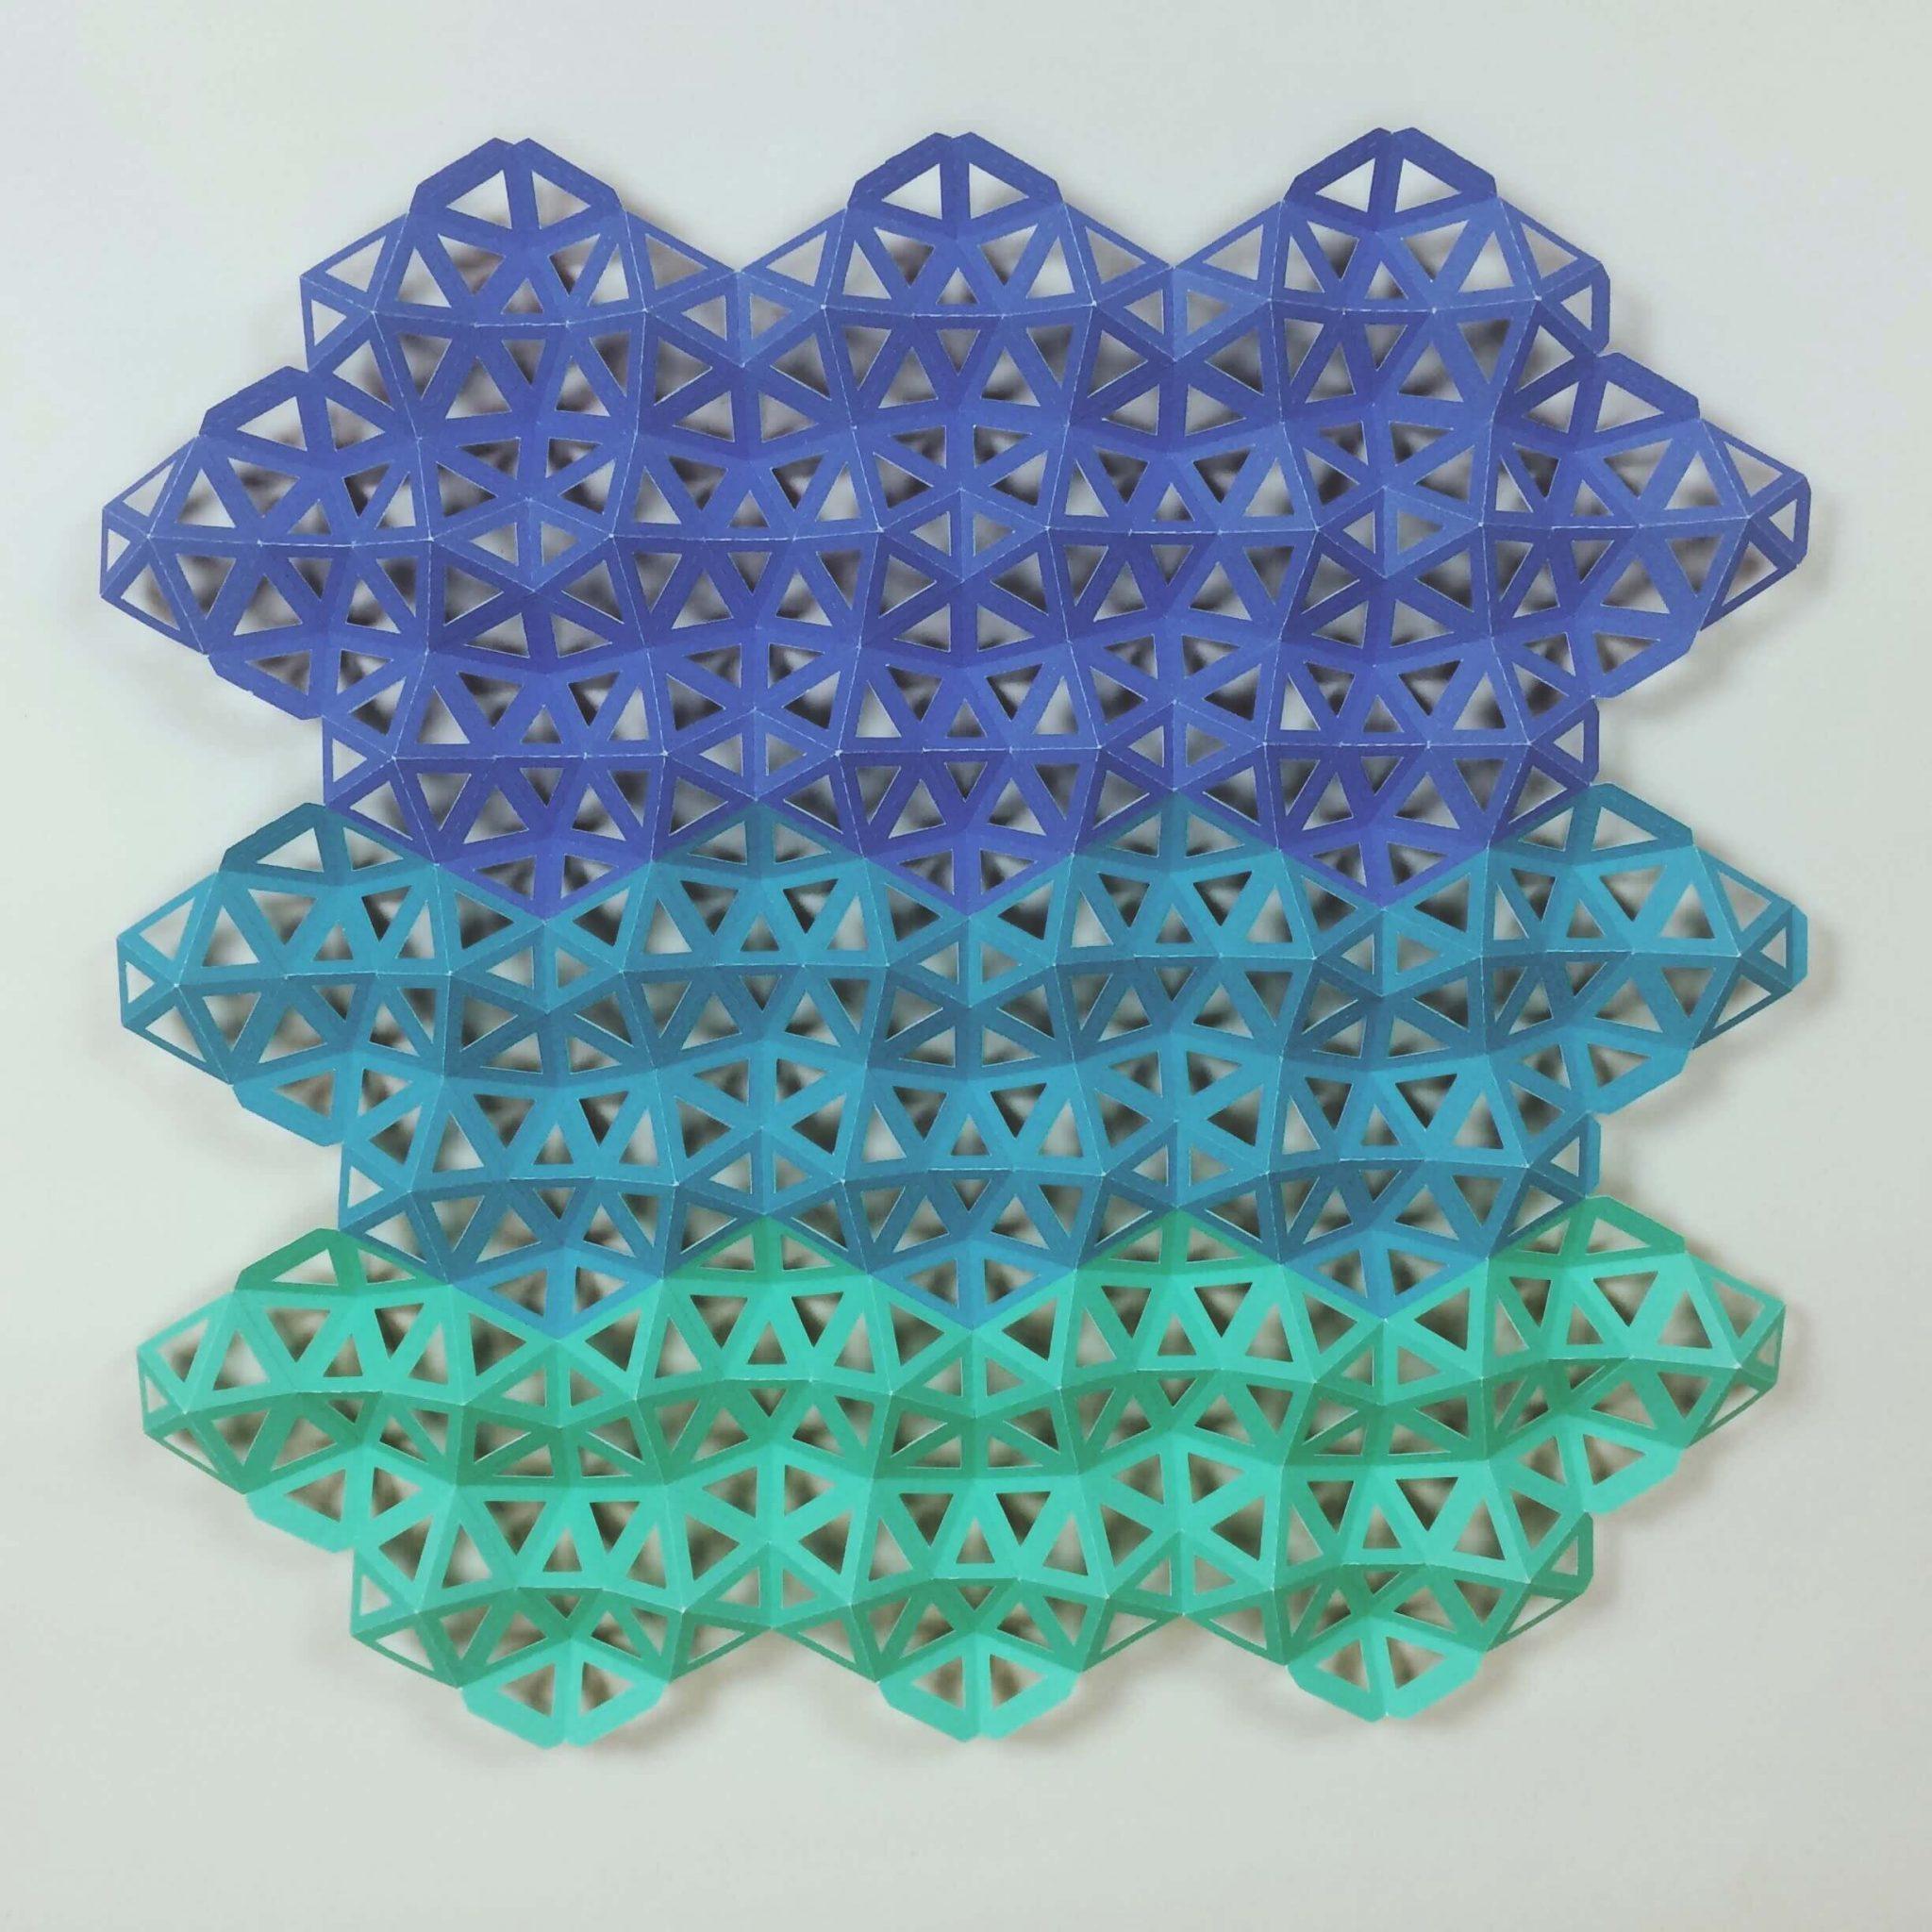 Sophie Ricketts papercraft artwork